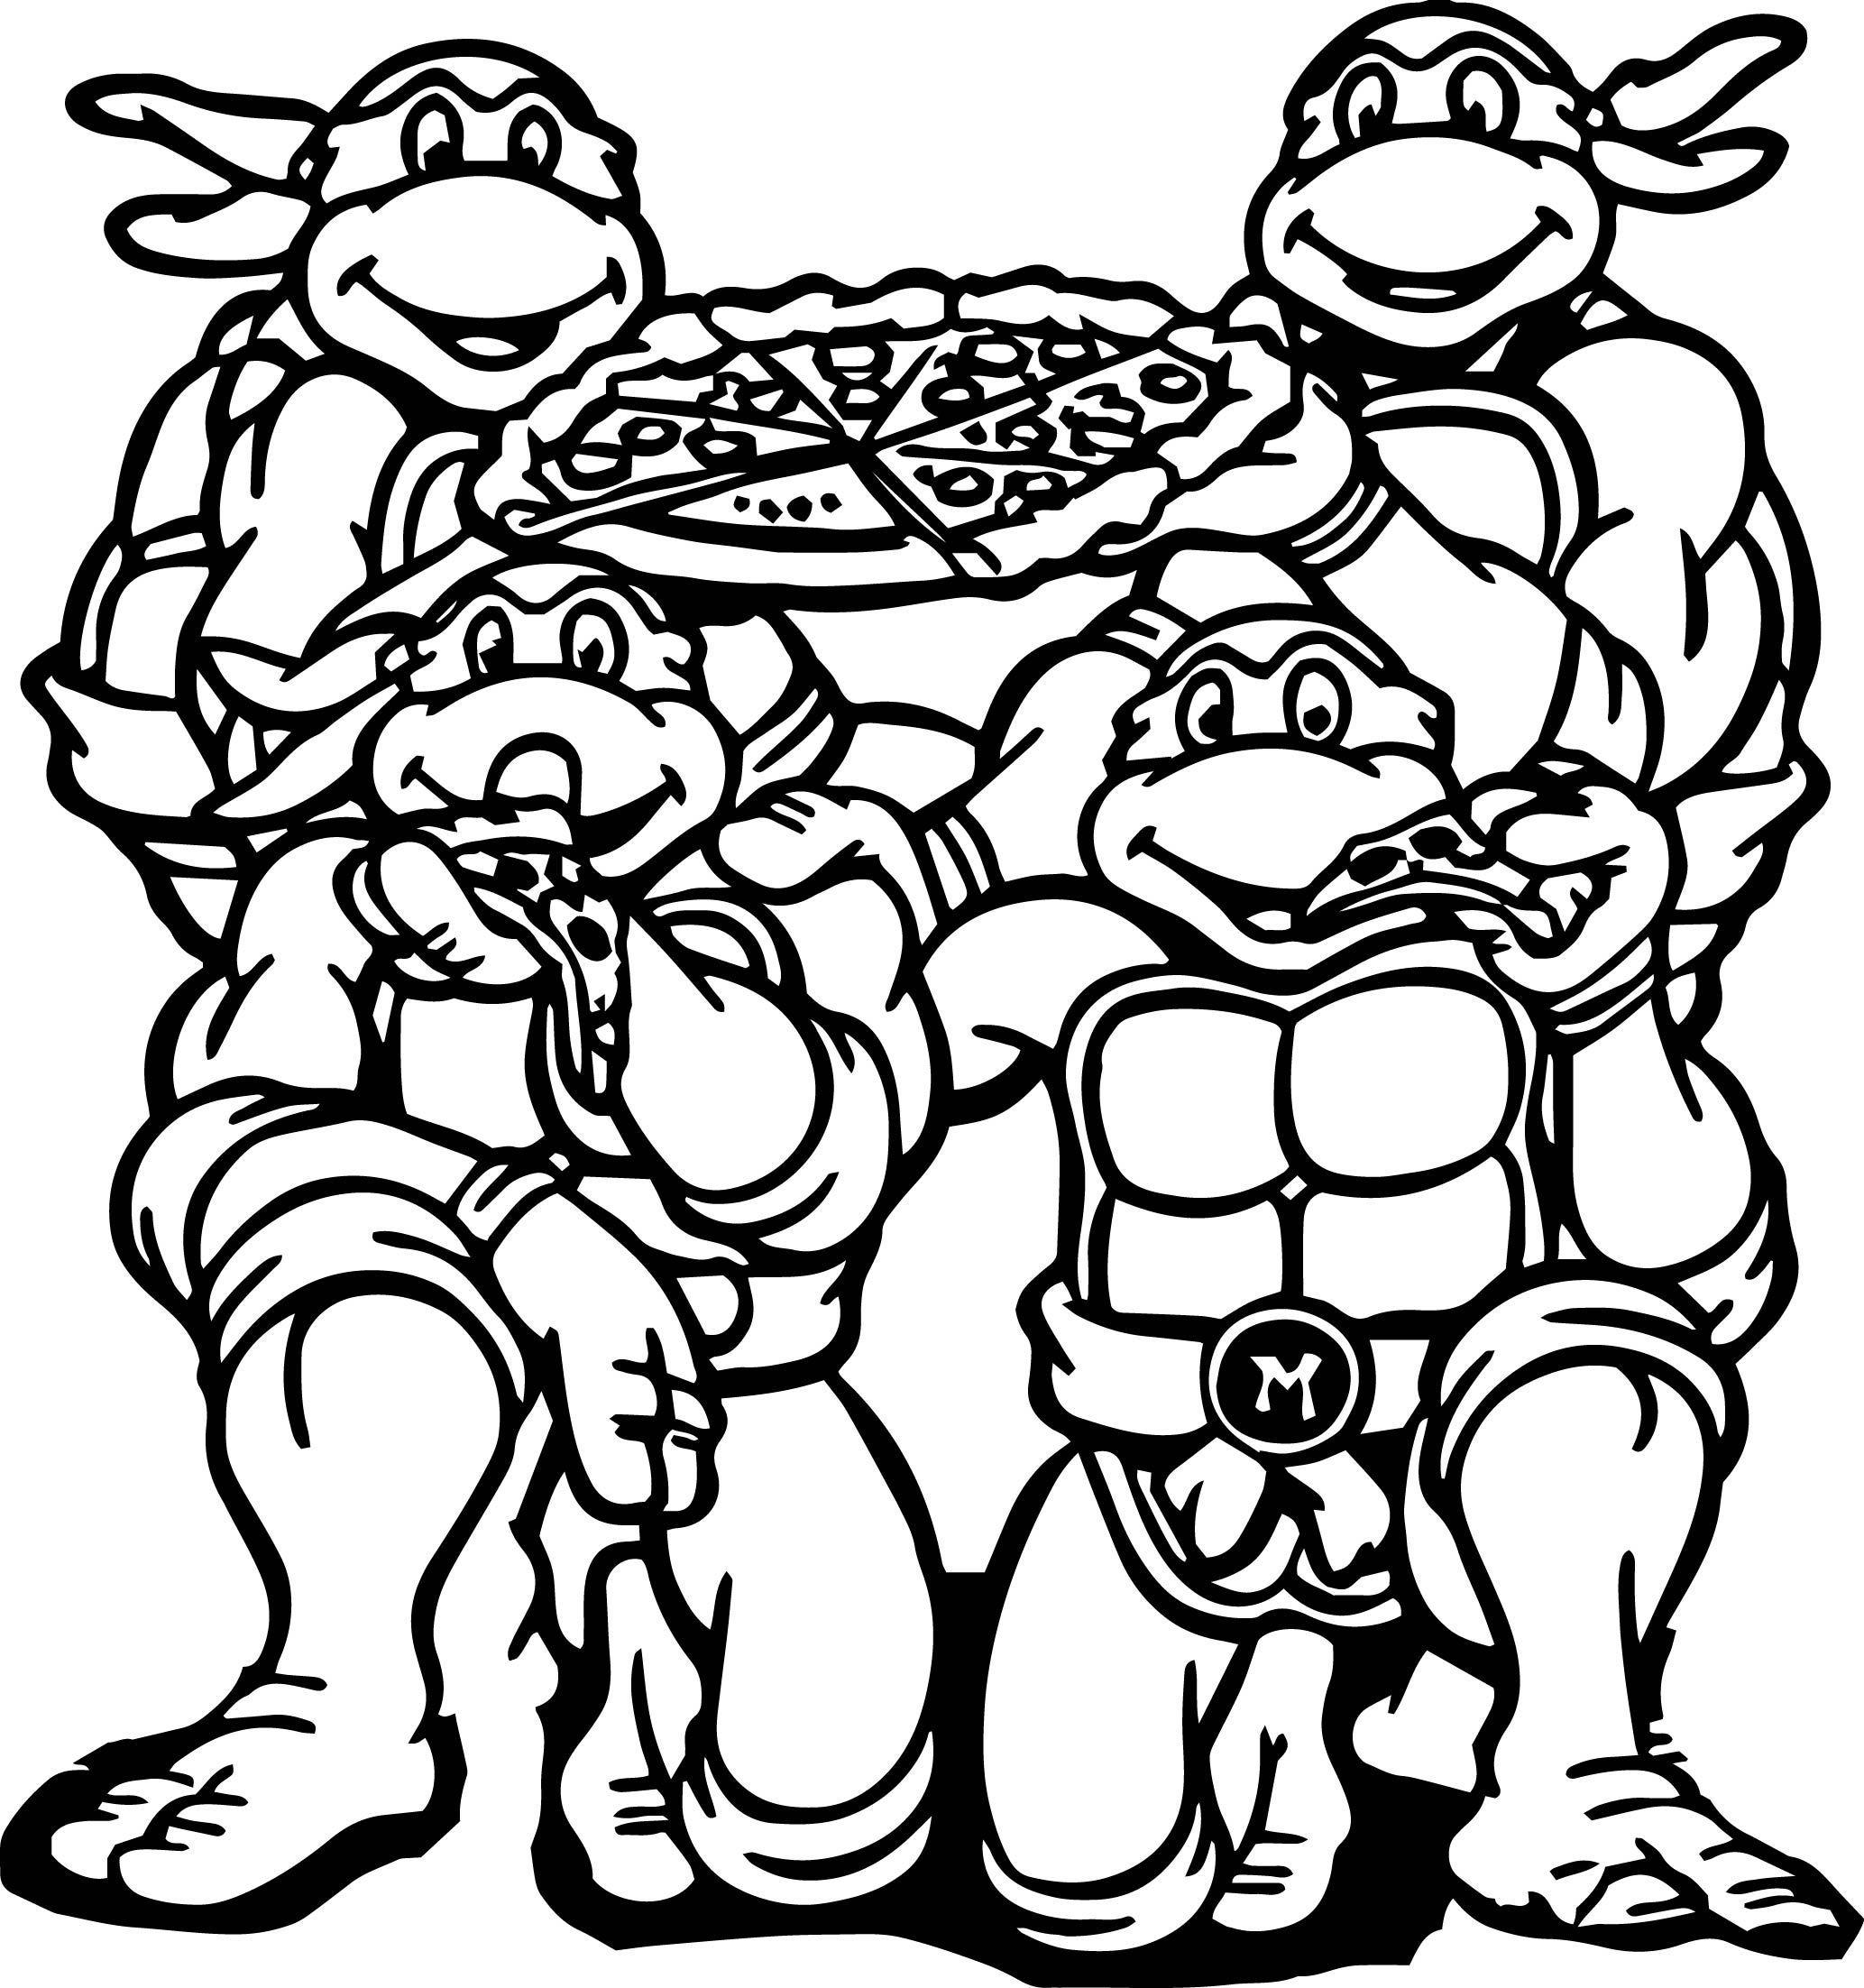 Teenage Mutant Ninja Turtles Shredder Coloring Pages At